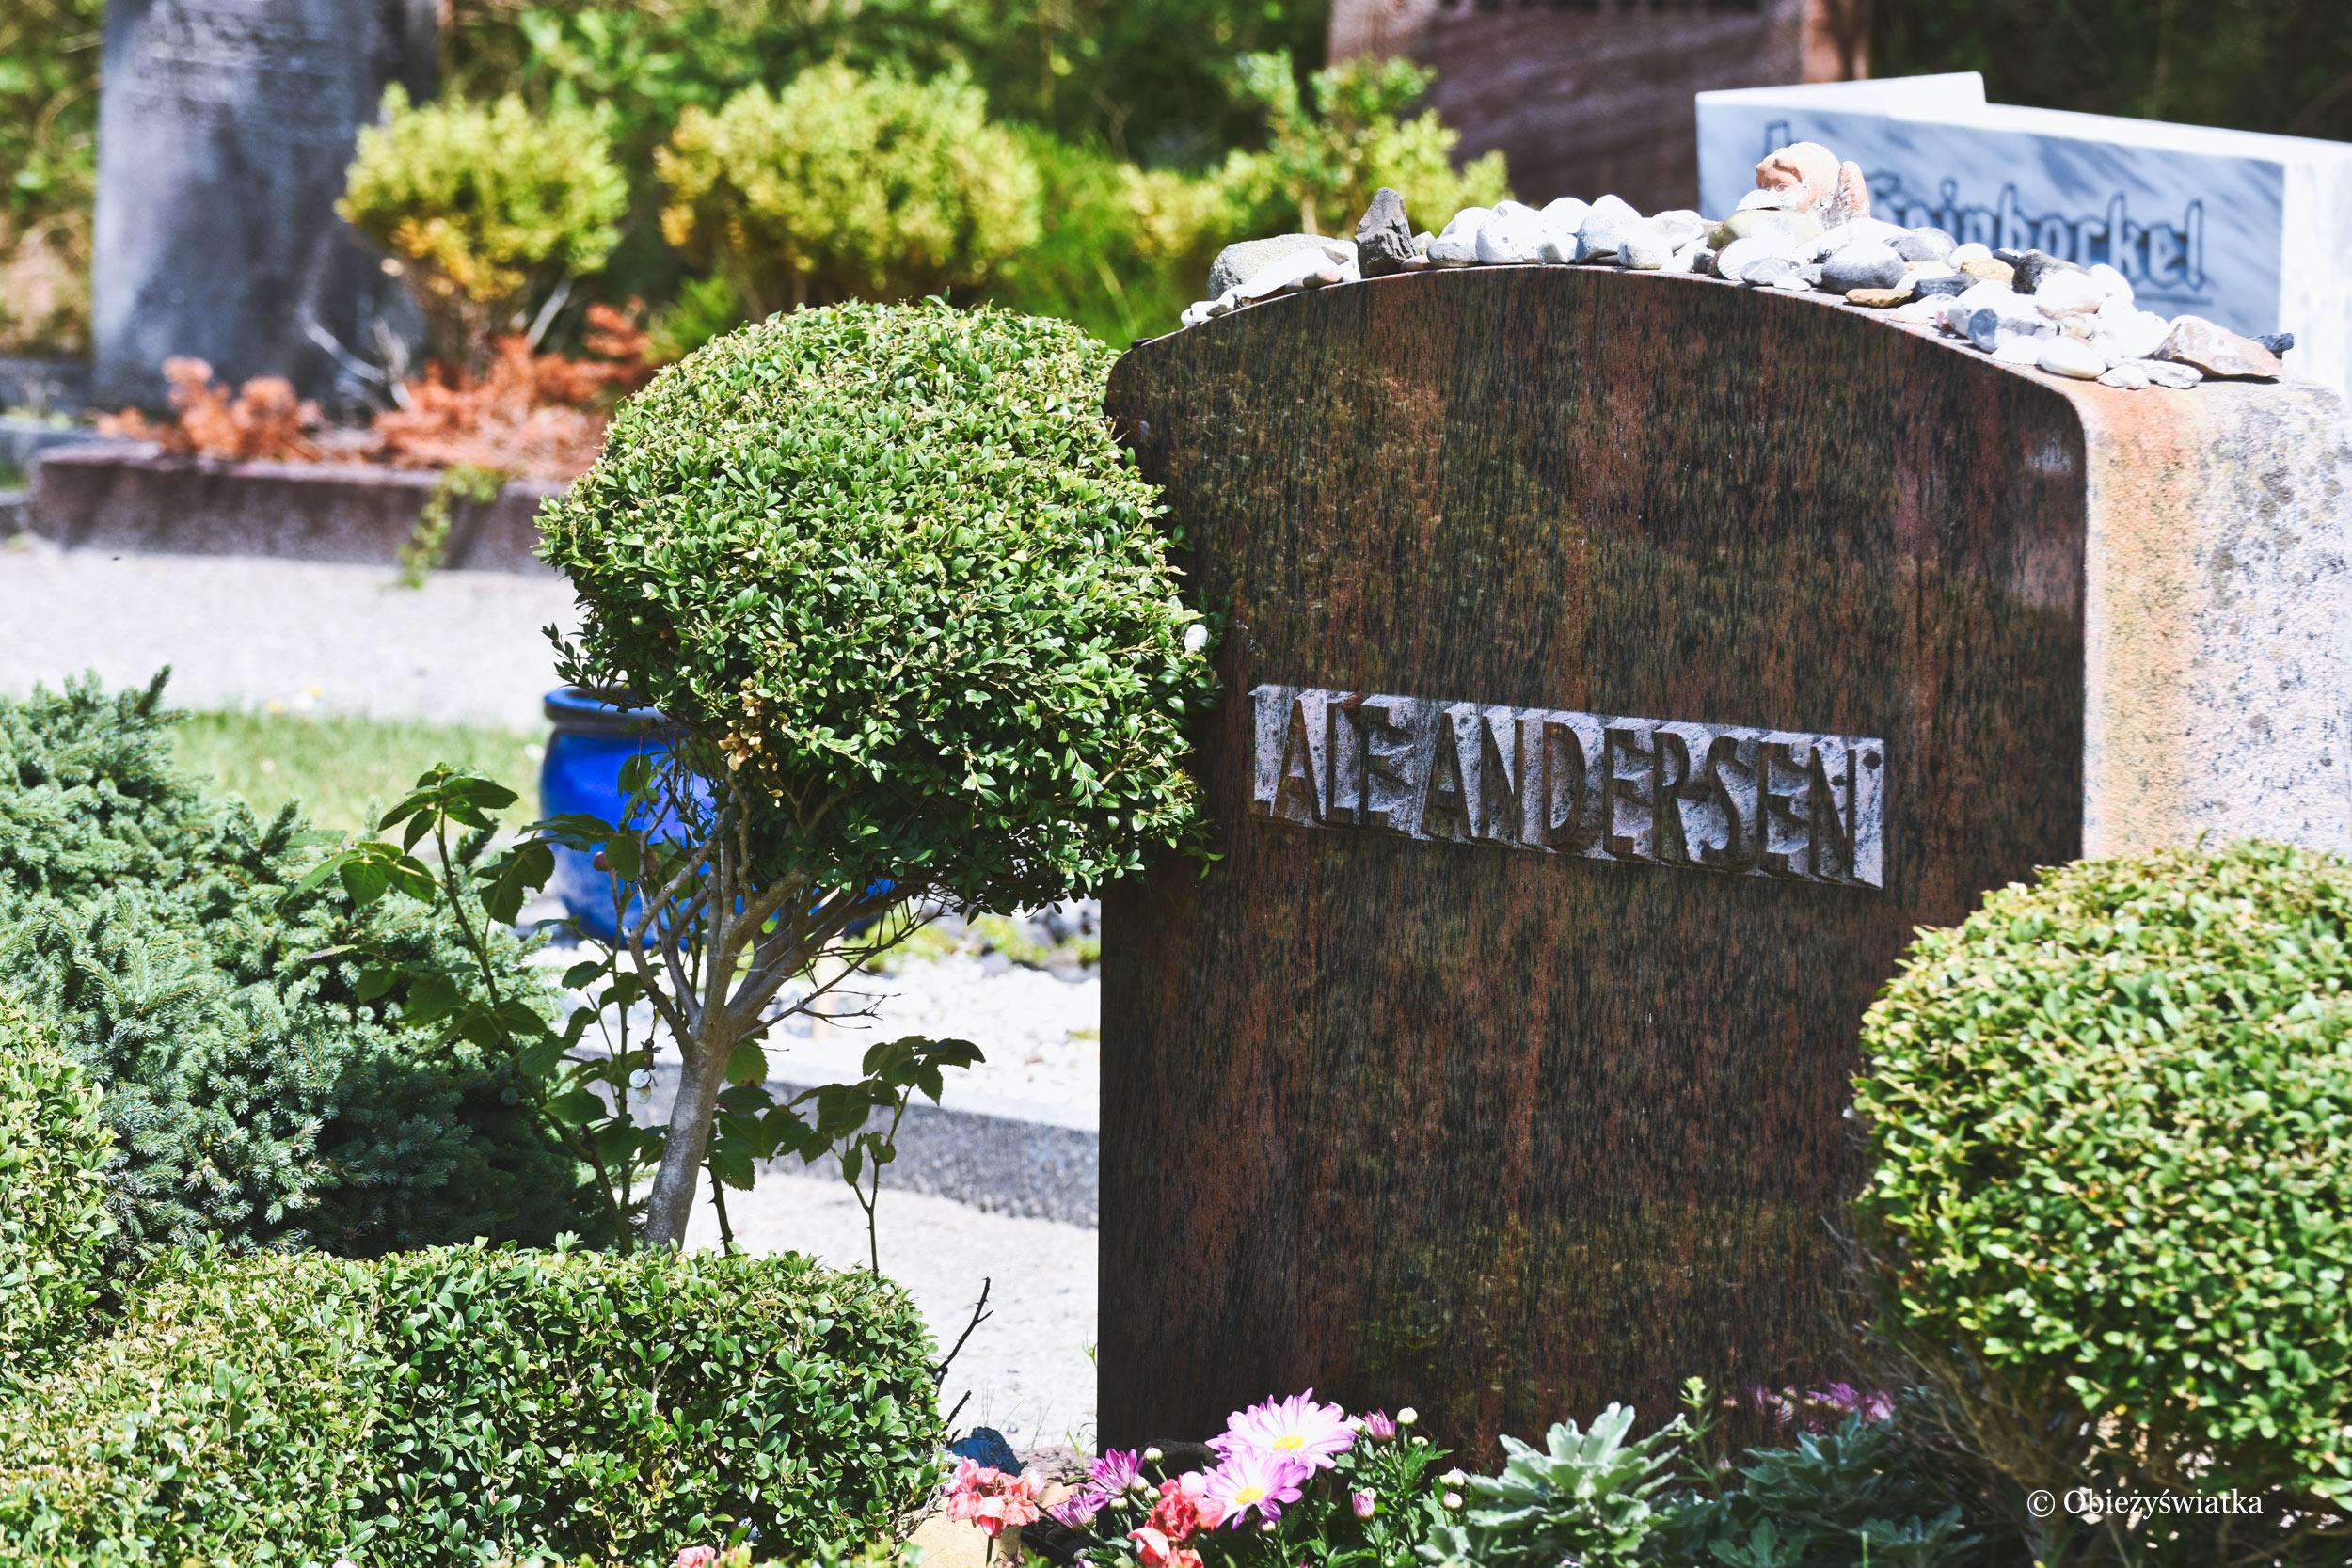 Grób Lale Andersen na Wyspie Langeoog